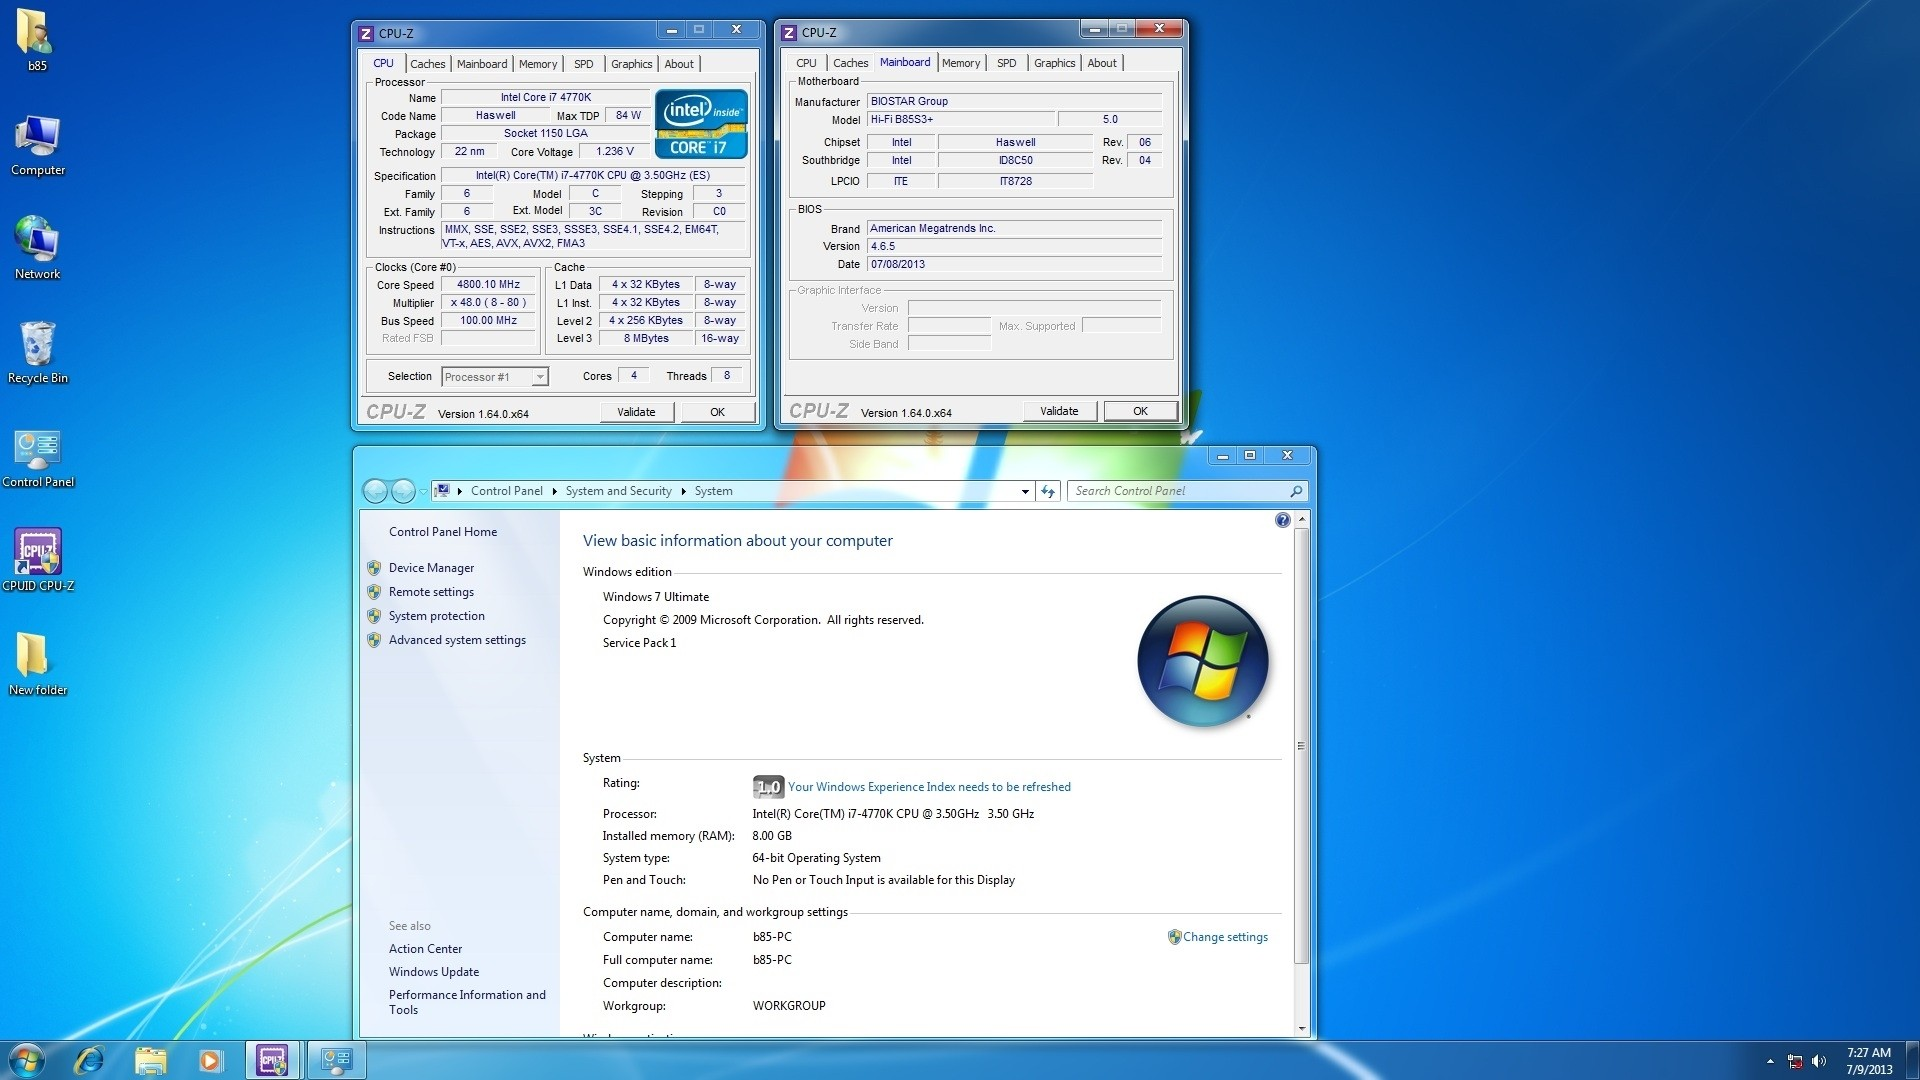 Biostar Announces BIOS Updates Enabling Overclocking on H87